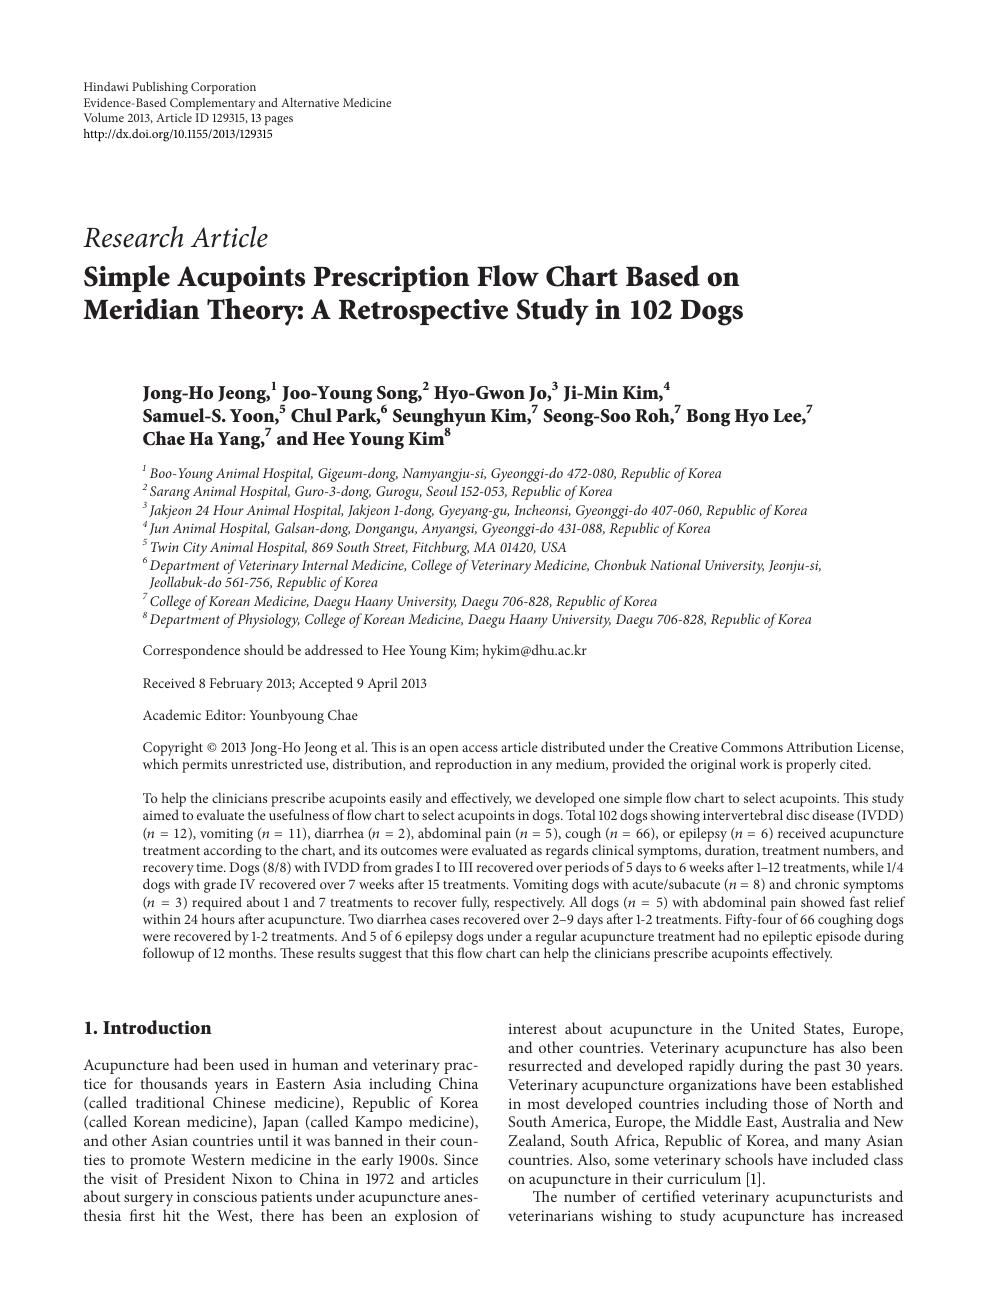 Simple Acupoints Prescription Flow Chart Based on Meridian